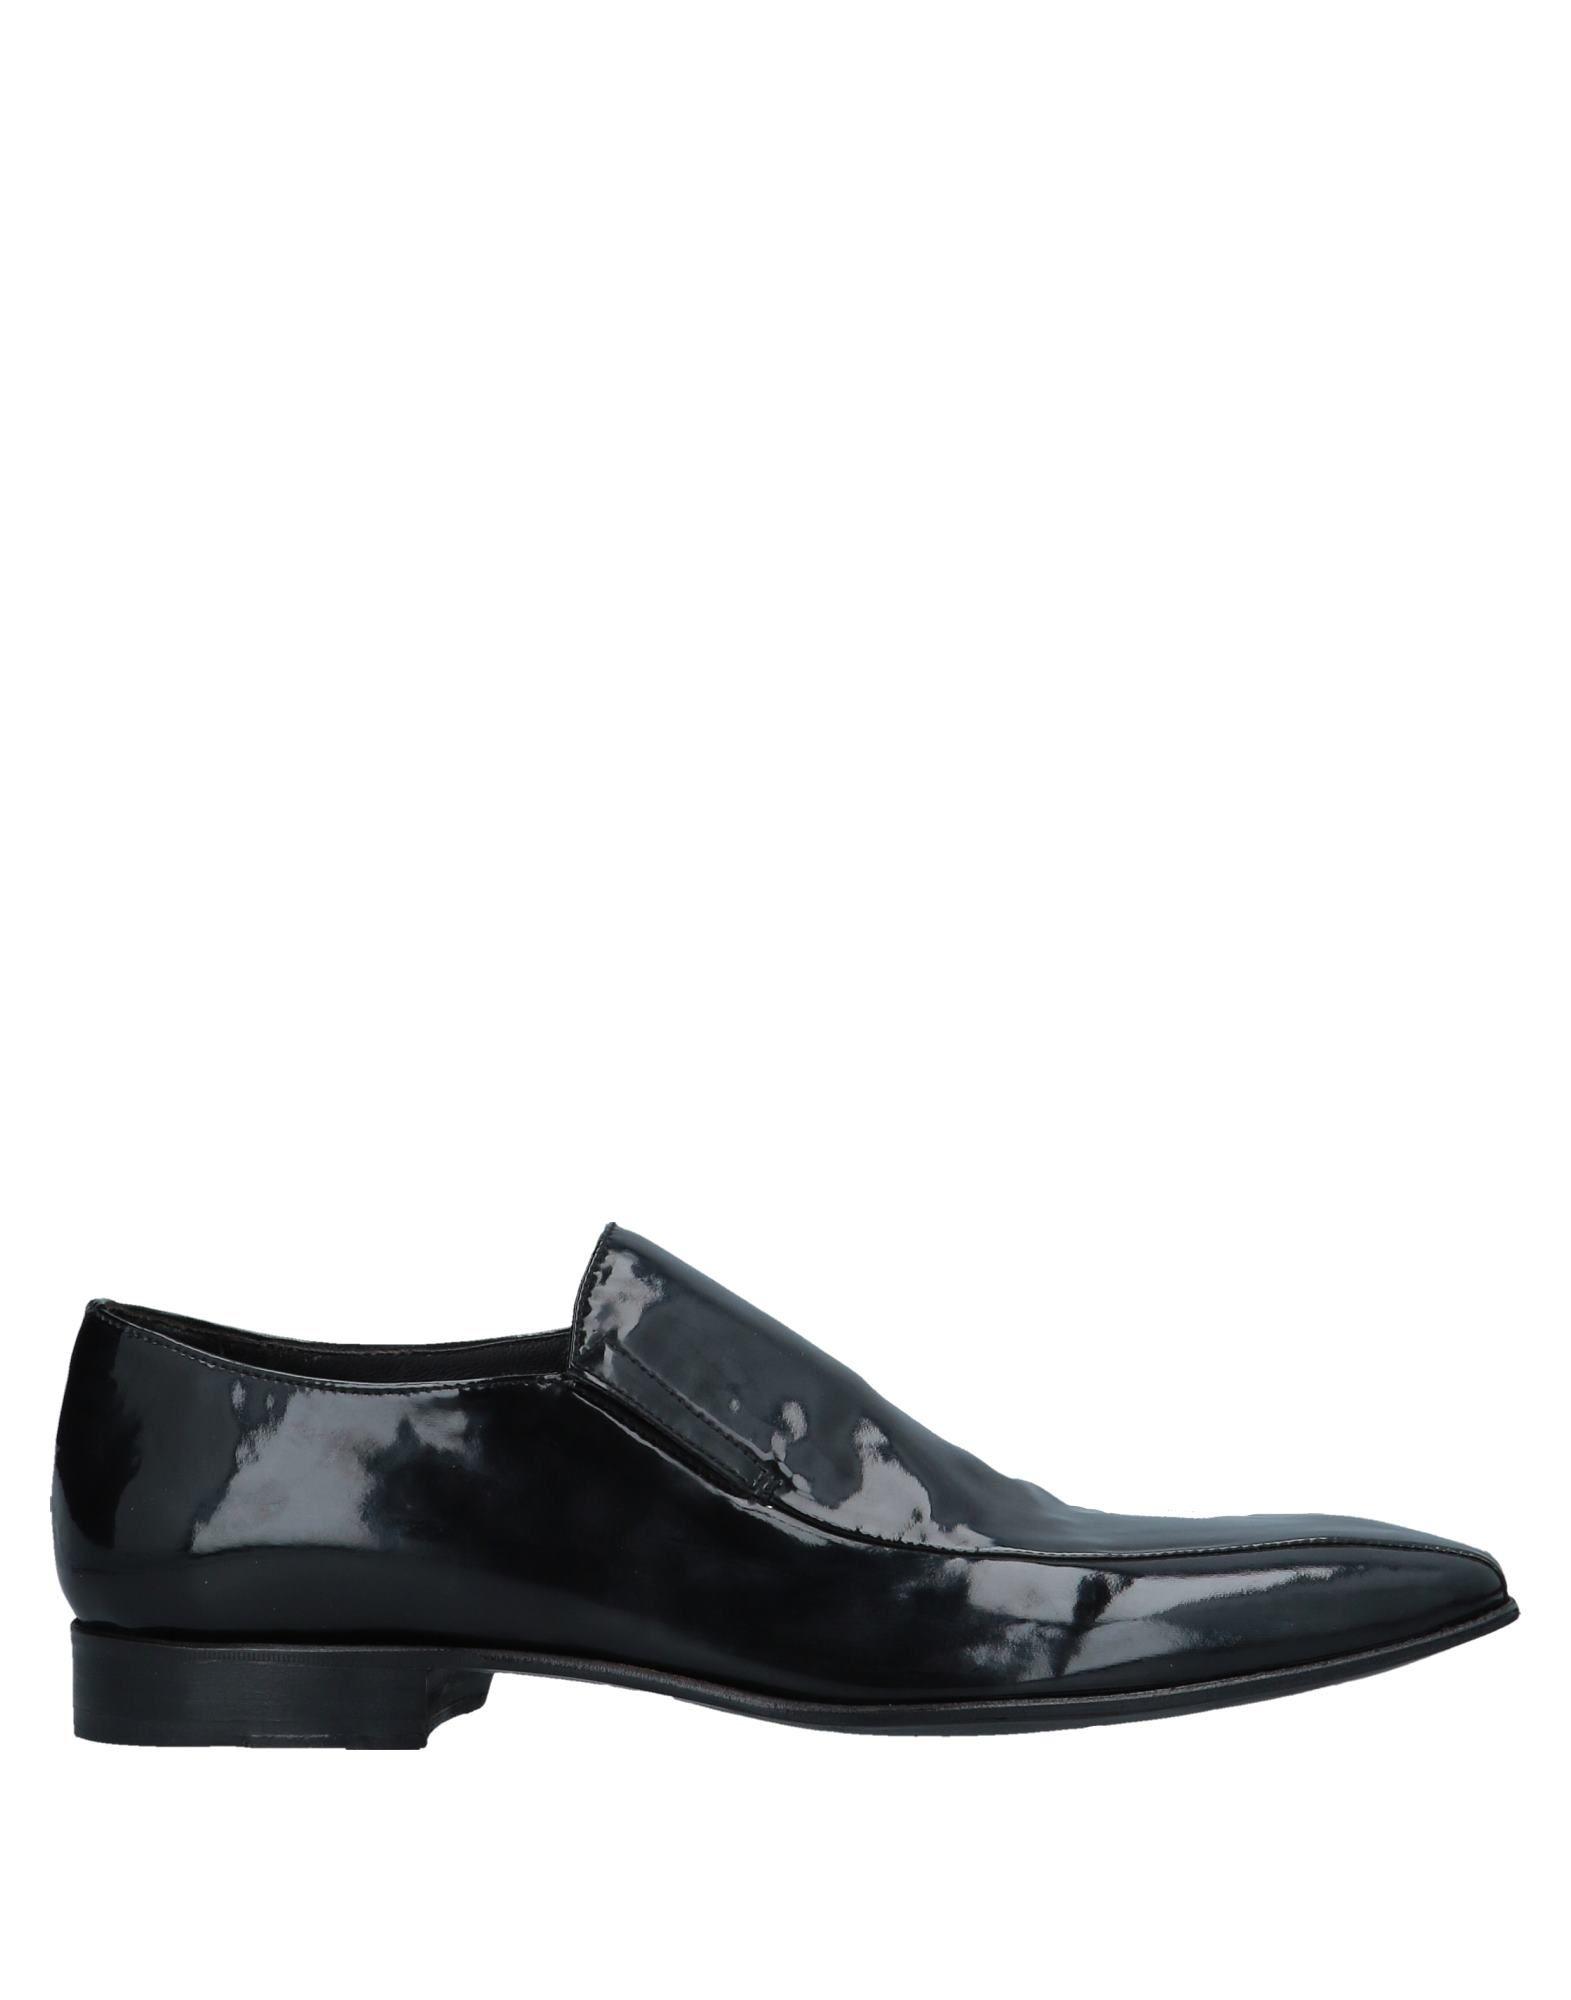 Rabatt echte Schuhe Cc Collection 11558605OT Corneliani Mokassins Herren  11558605OT Collection 894d17